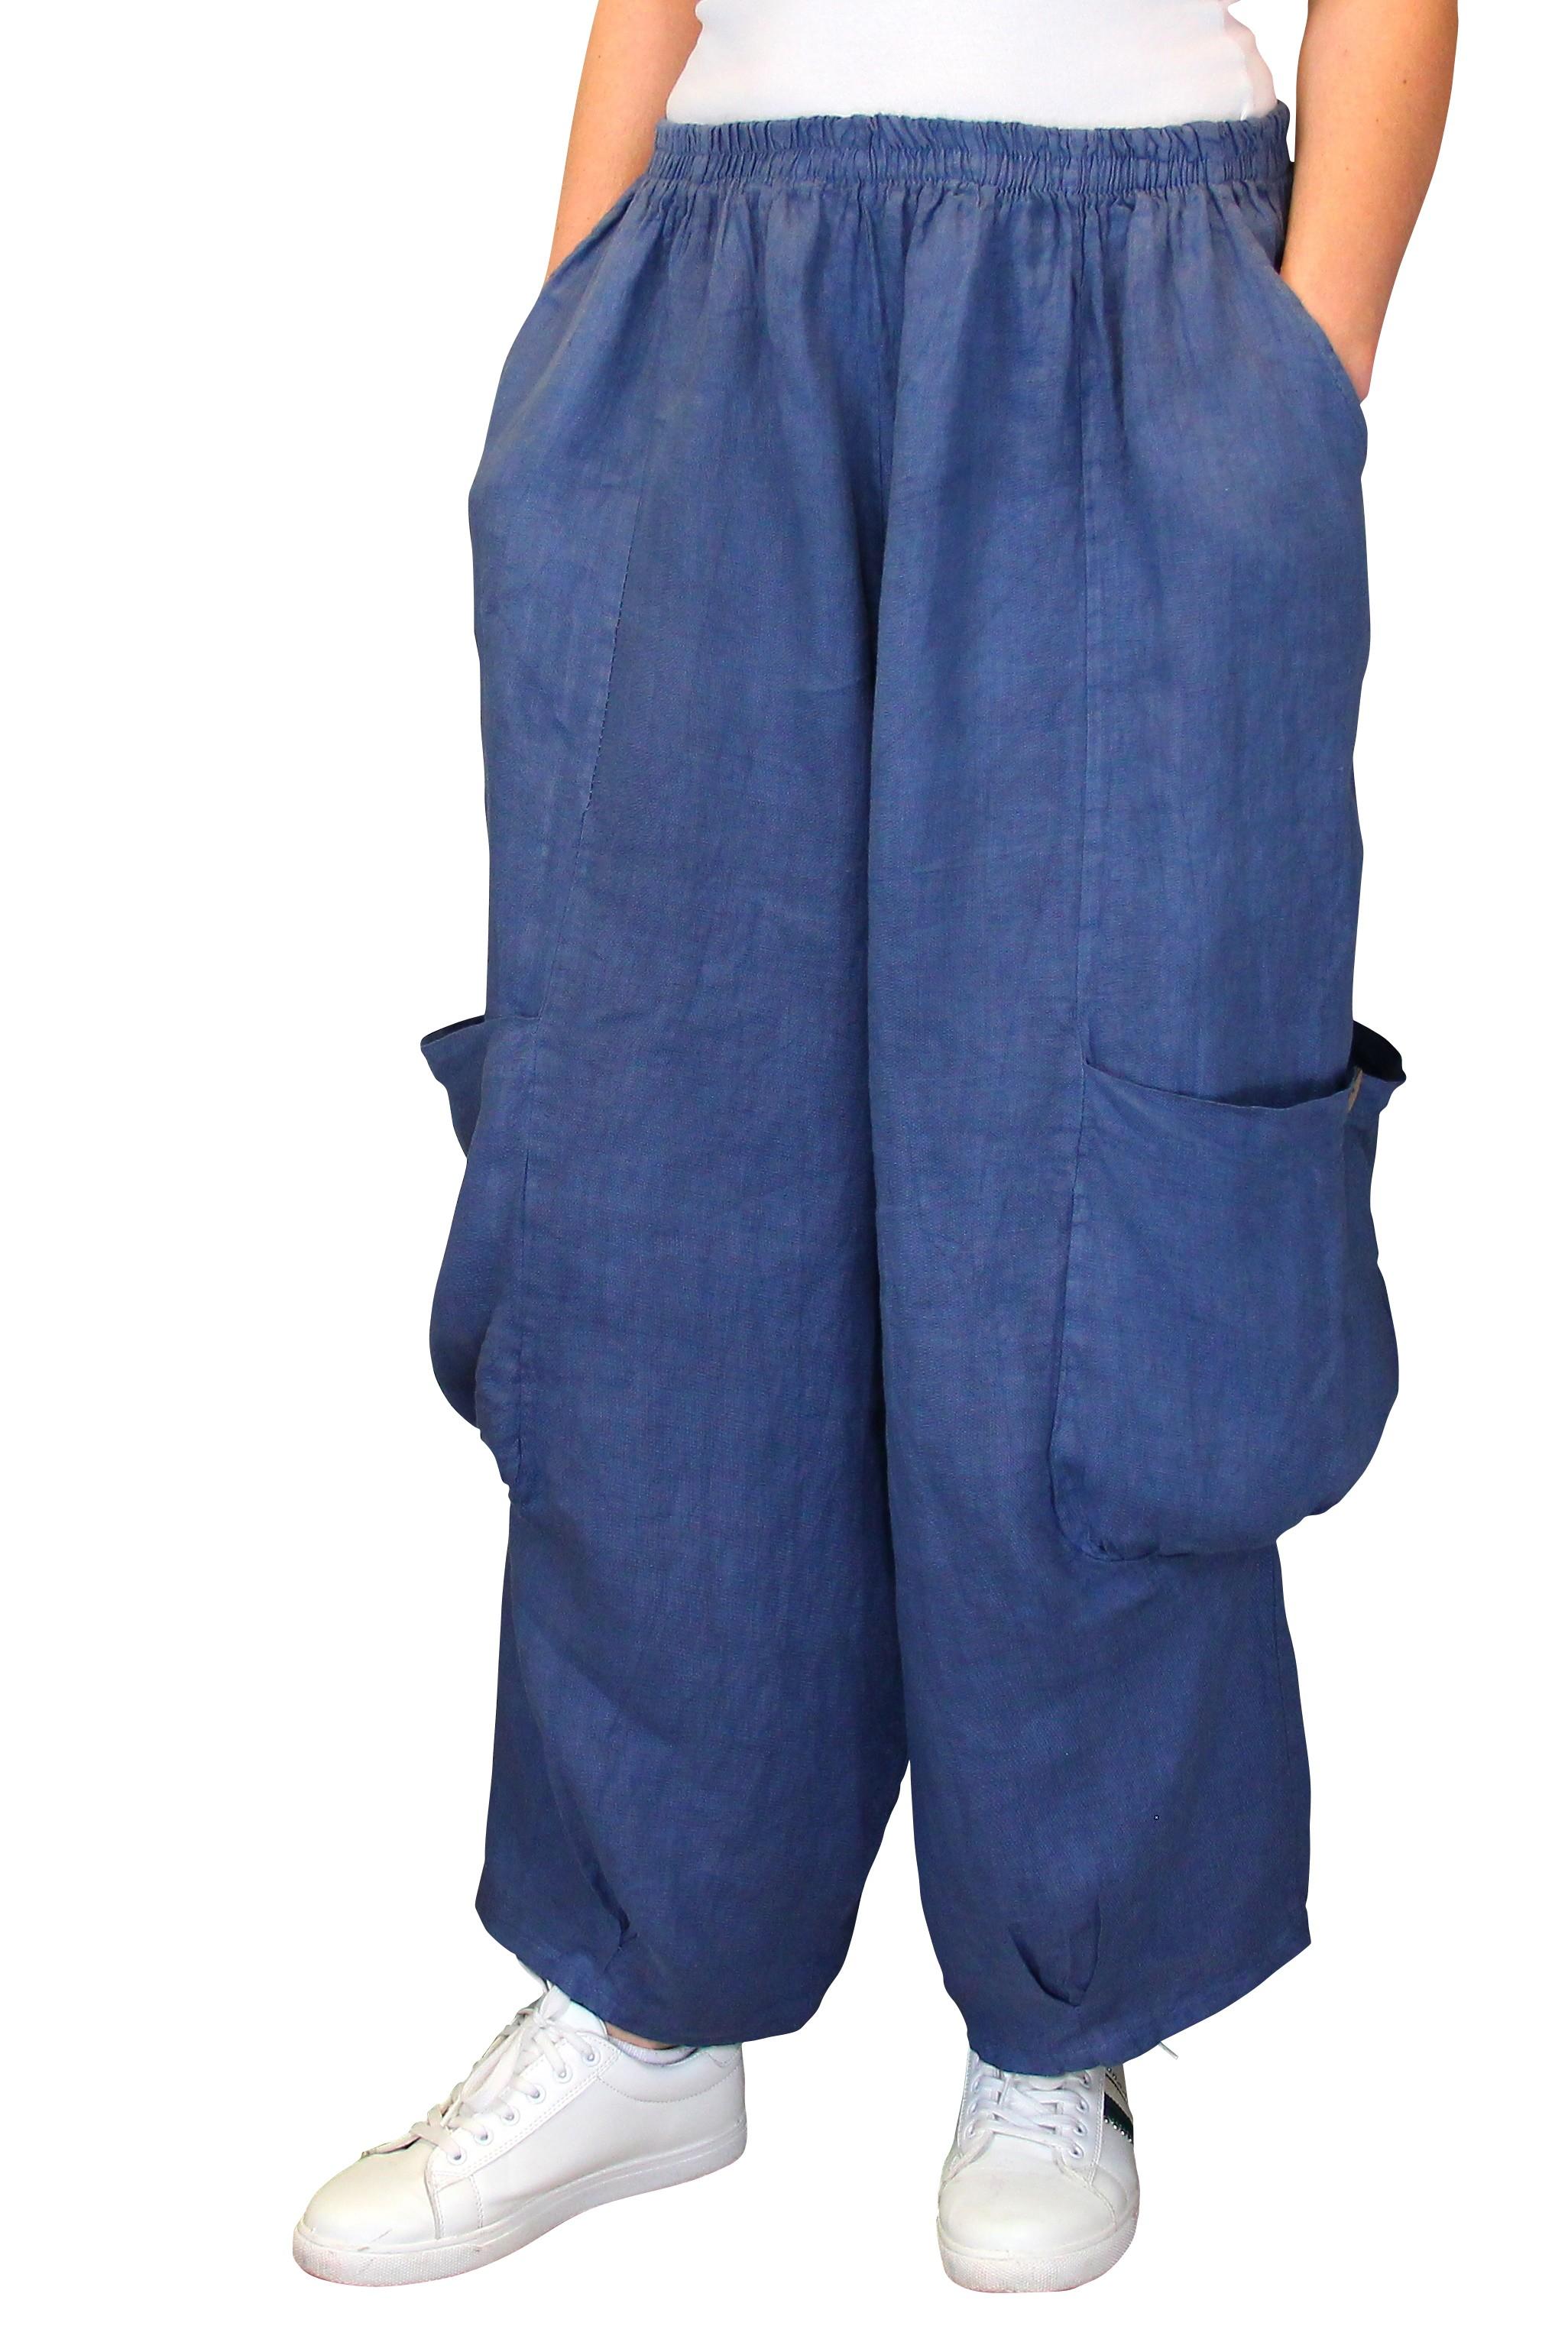 Pantalon femme lin grande taille ample bleu jean anthos - Pantalon ample femme ...